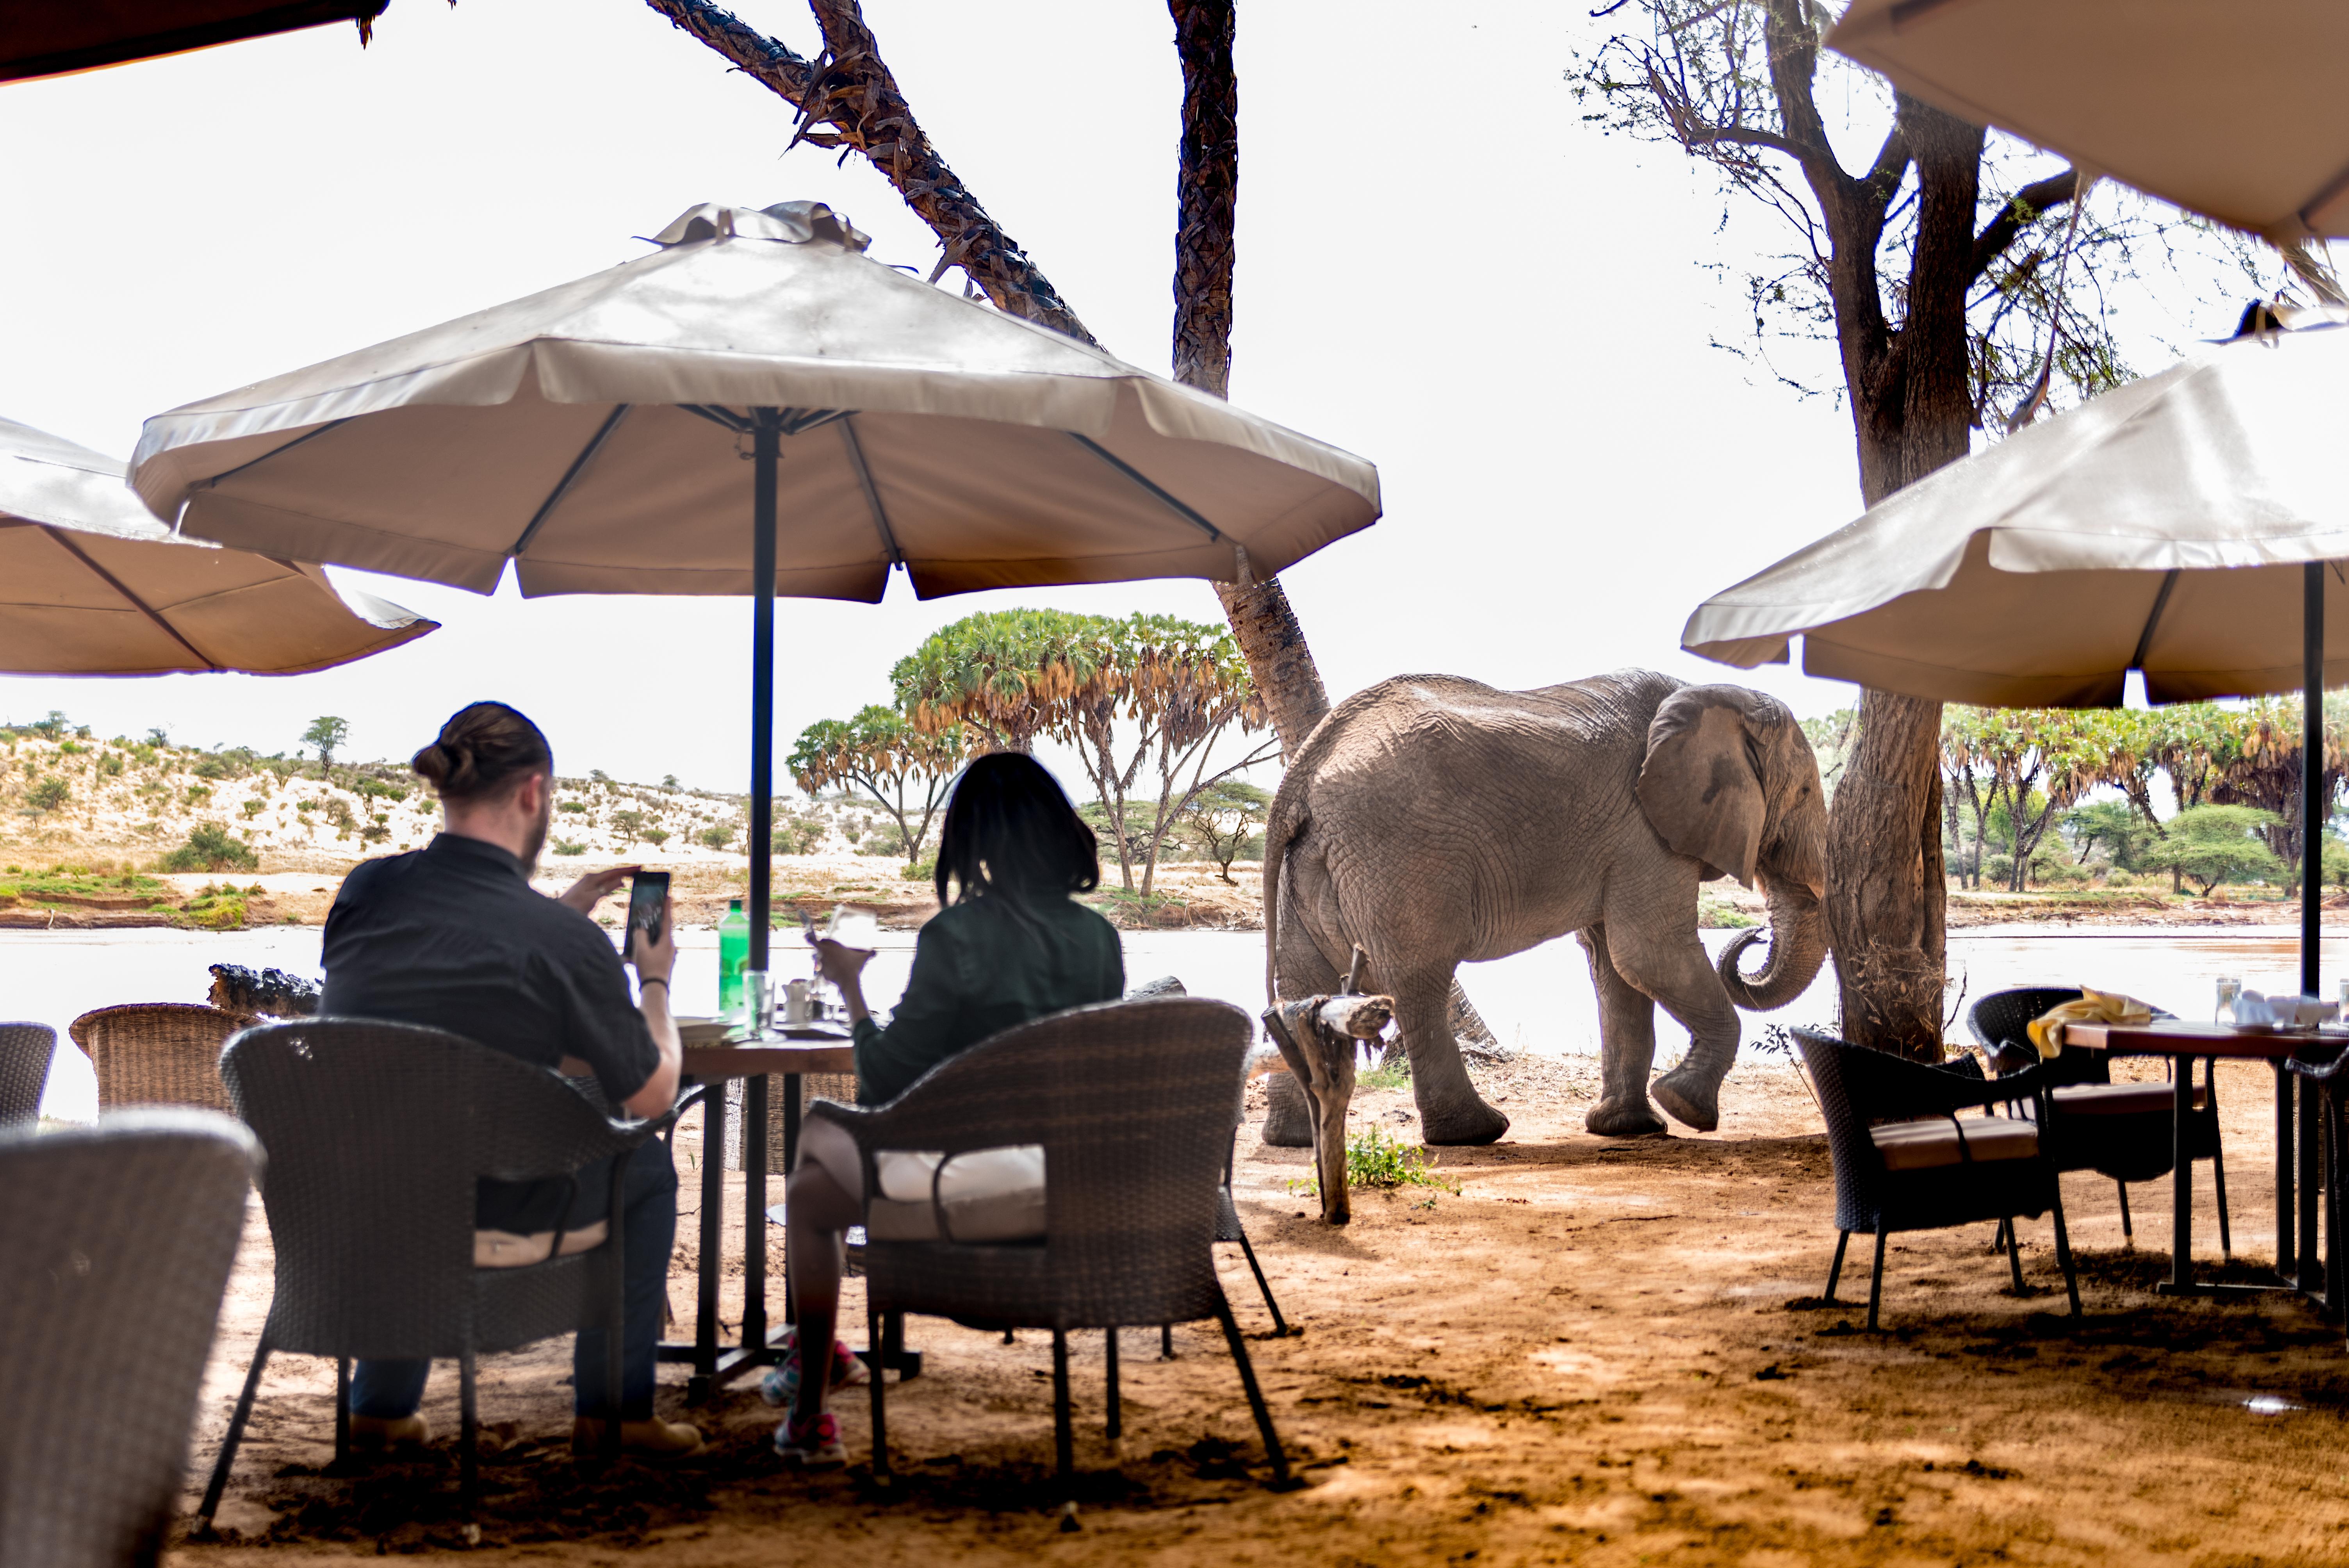 Elephant Bedroom Camp Breakfast Area